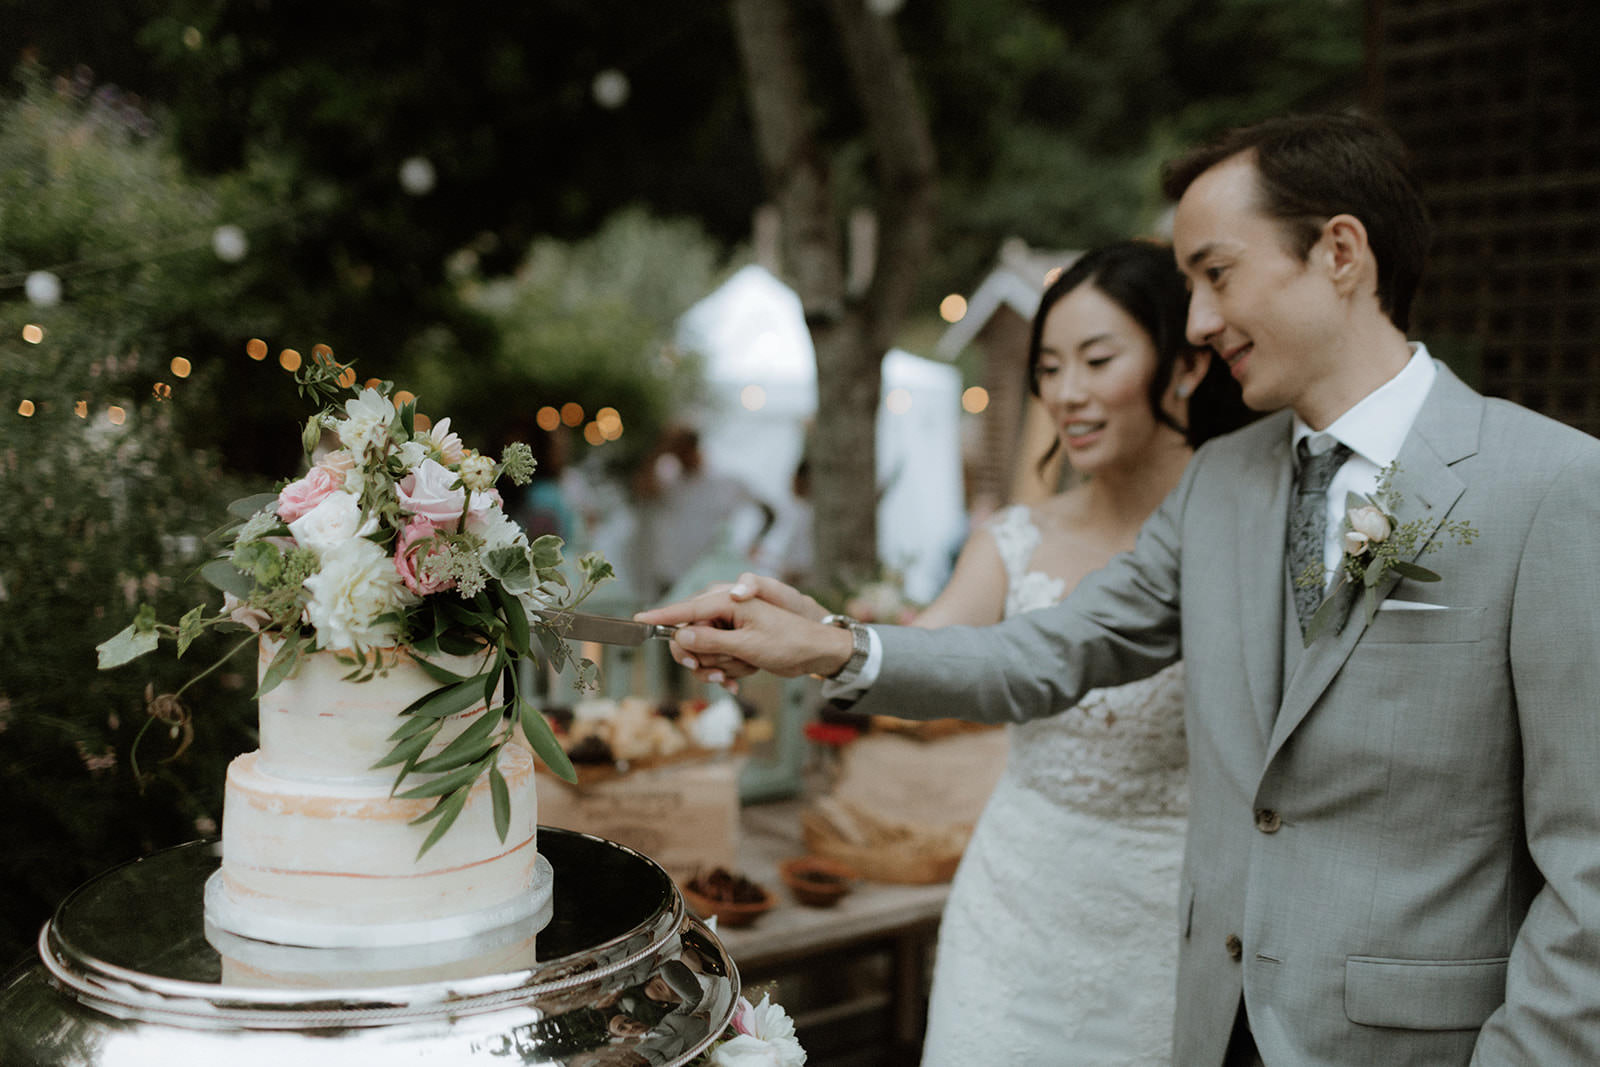 Cake Cutting at Rustic Anvil Island Wedding in British Columbia West Coast Weddings Magazine